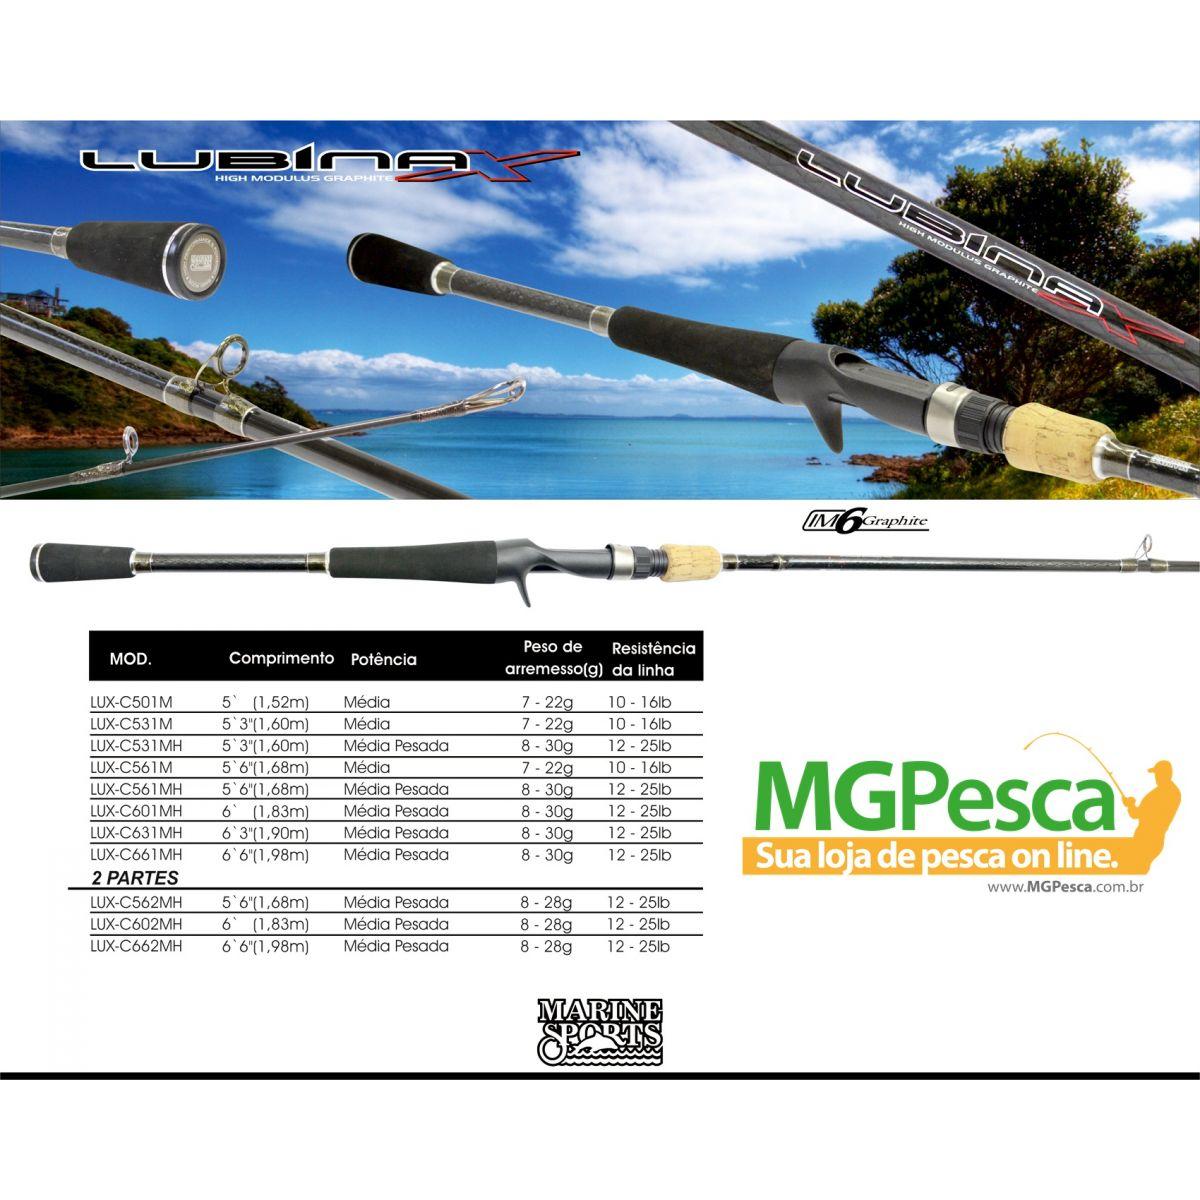 "Vara para carretilha Marine Sports Lubina X 5"" (1,52m) 16 Lbs - LUX-C501M  - MGPesca"